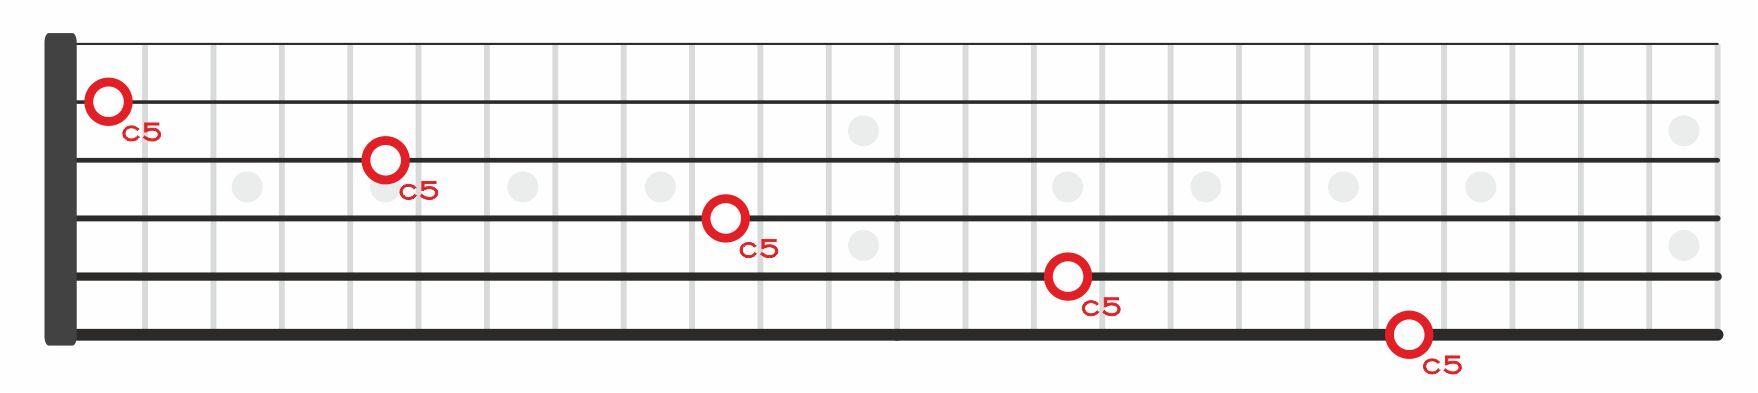 c5 do cinco en el diapasón de la guitarra